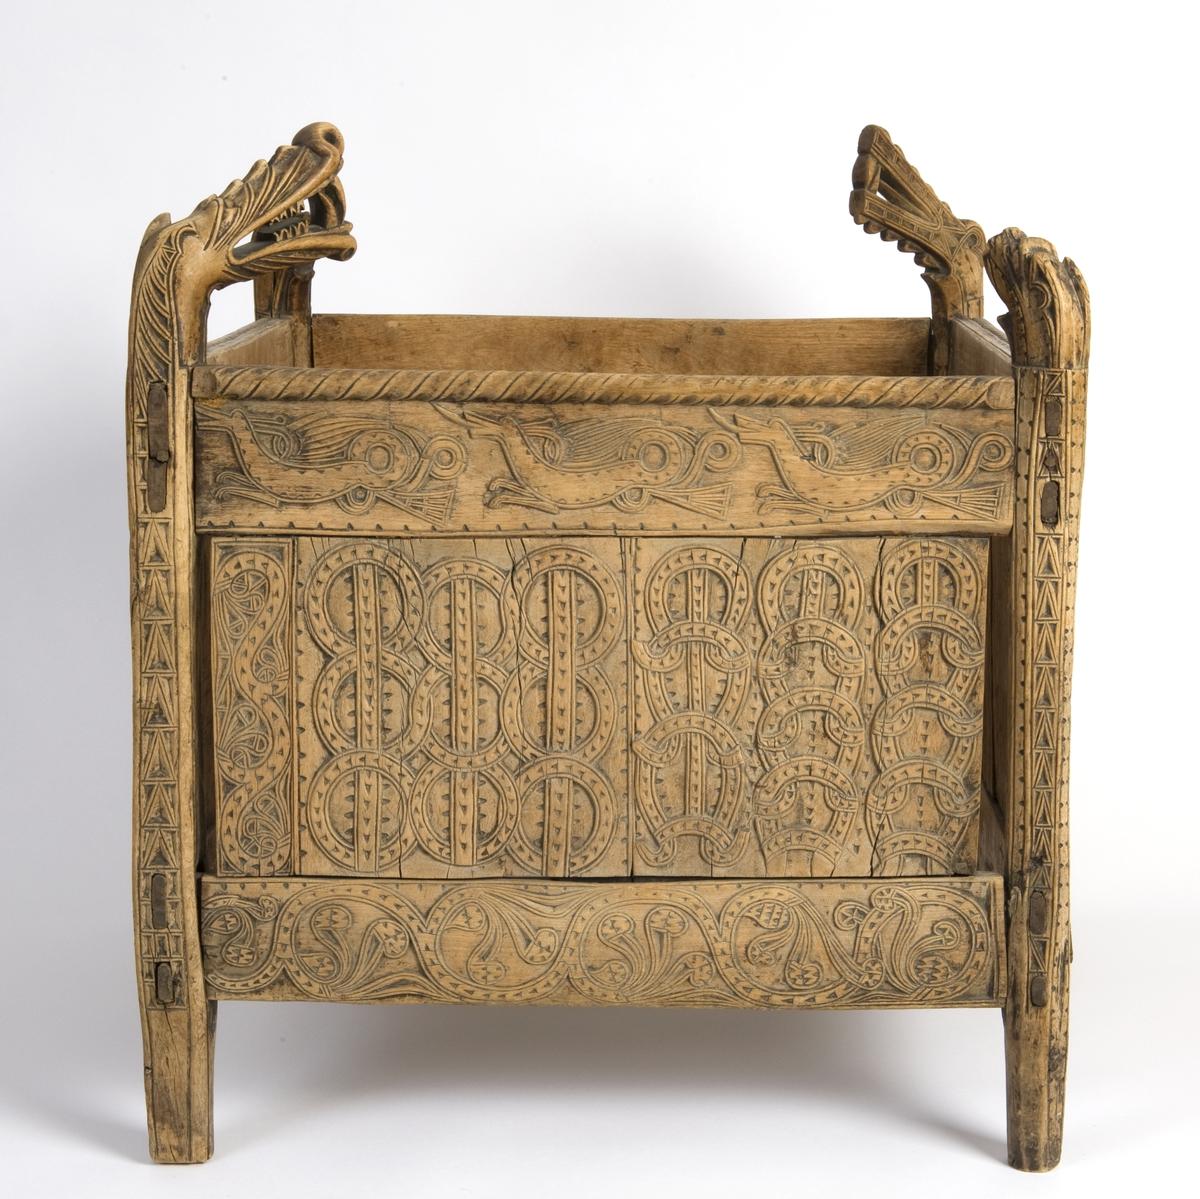 Koszyk na nici. ok 1440r. Anne-Lise Reinsfelt / Norsk Folkemuseum